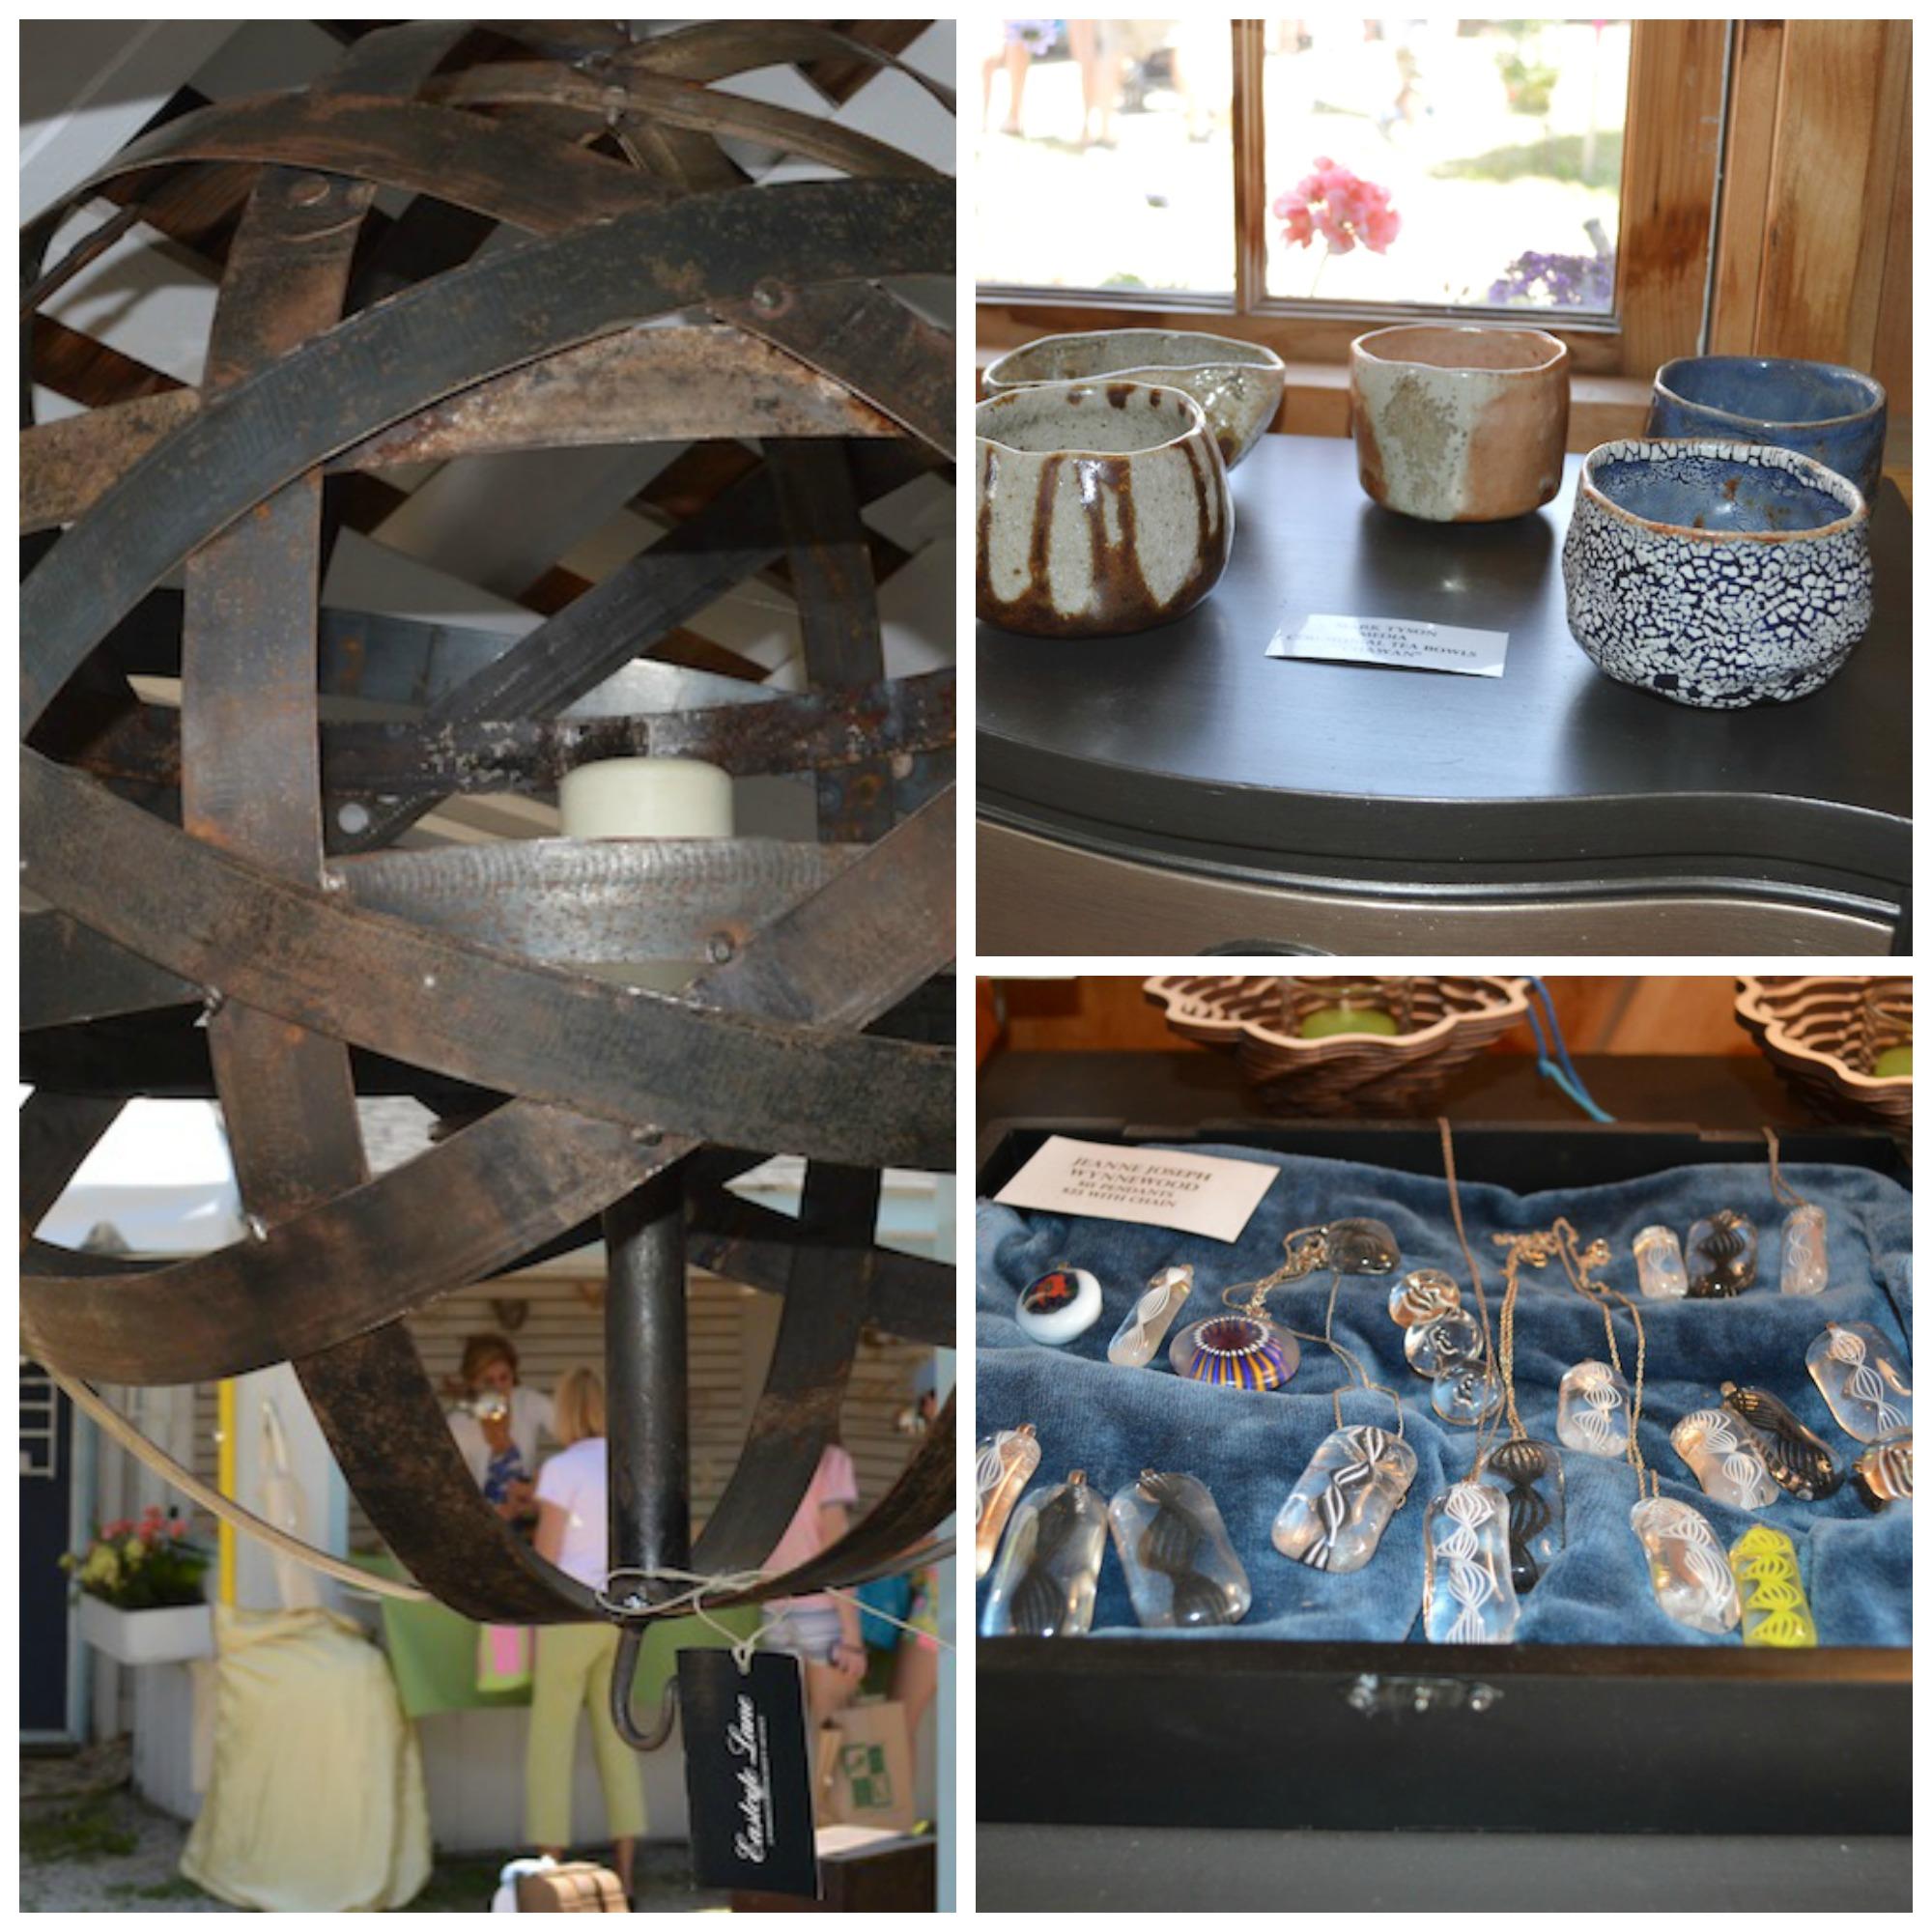 rtisan finds at Eastcote Lane: Wynnewood industrial artist Paul Nelson's bourbon-barrel-strap lanterns, Media potter Mark Tyson's tea bowls and pendants by Jeanne Joseph.